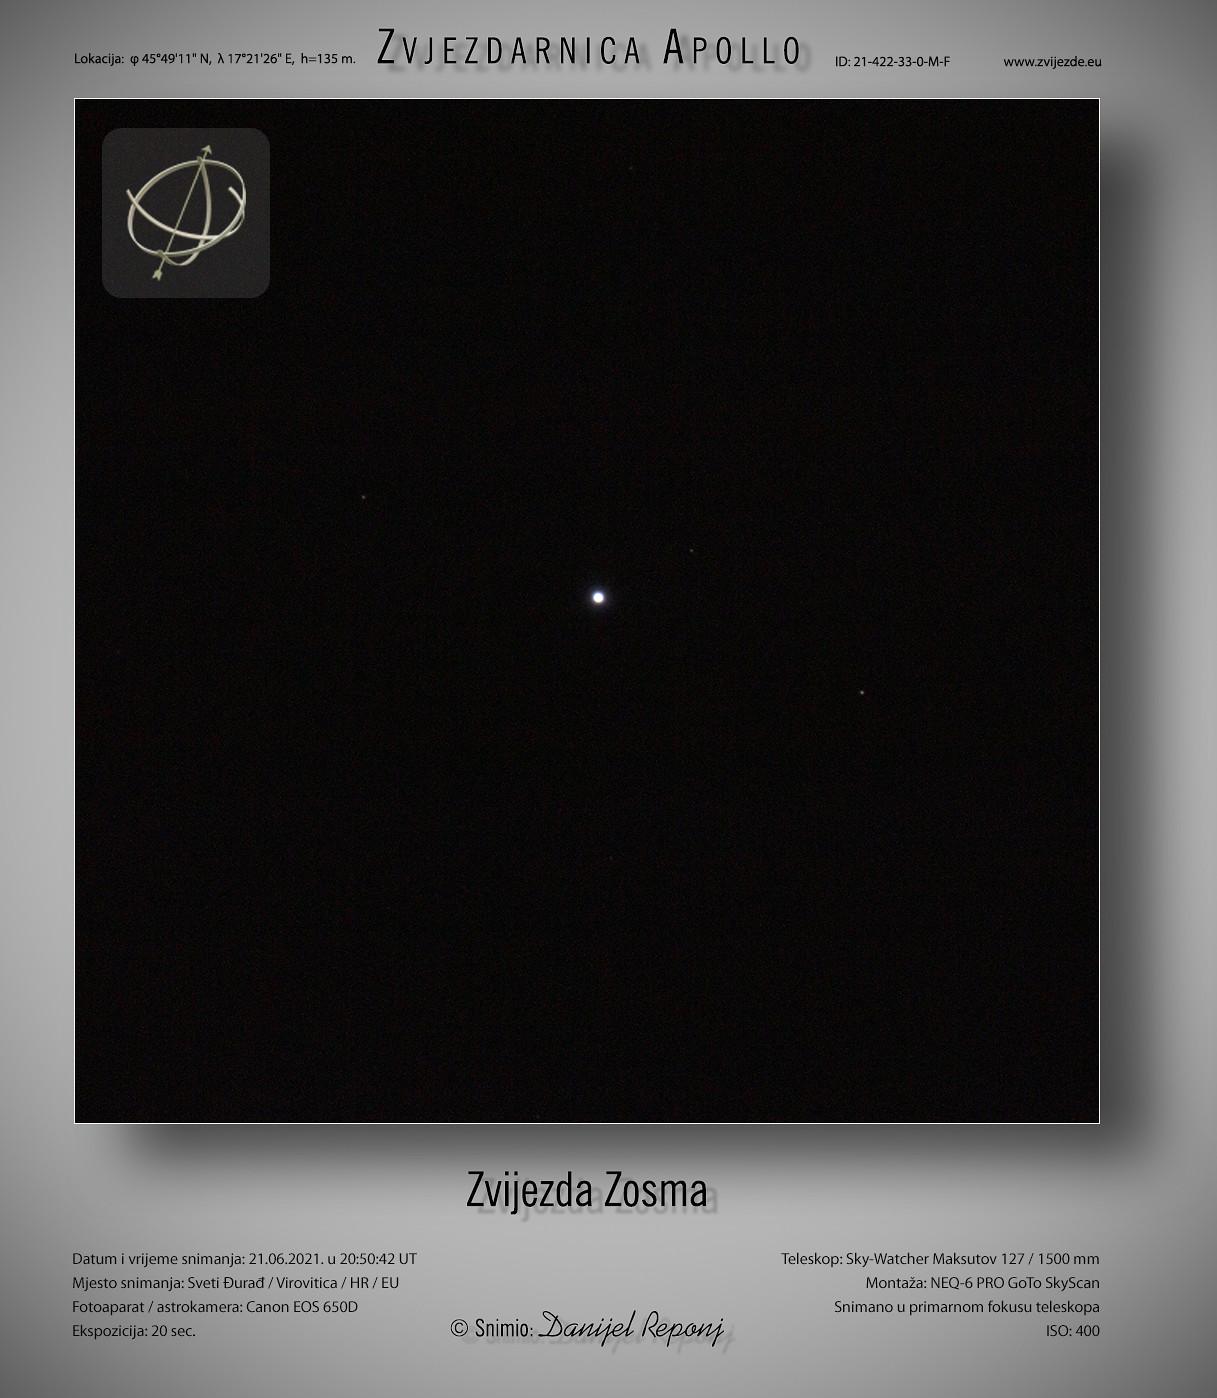 Zvijezda Zosma, 21.6.2021.